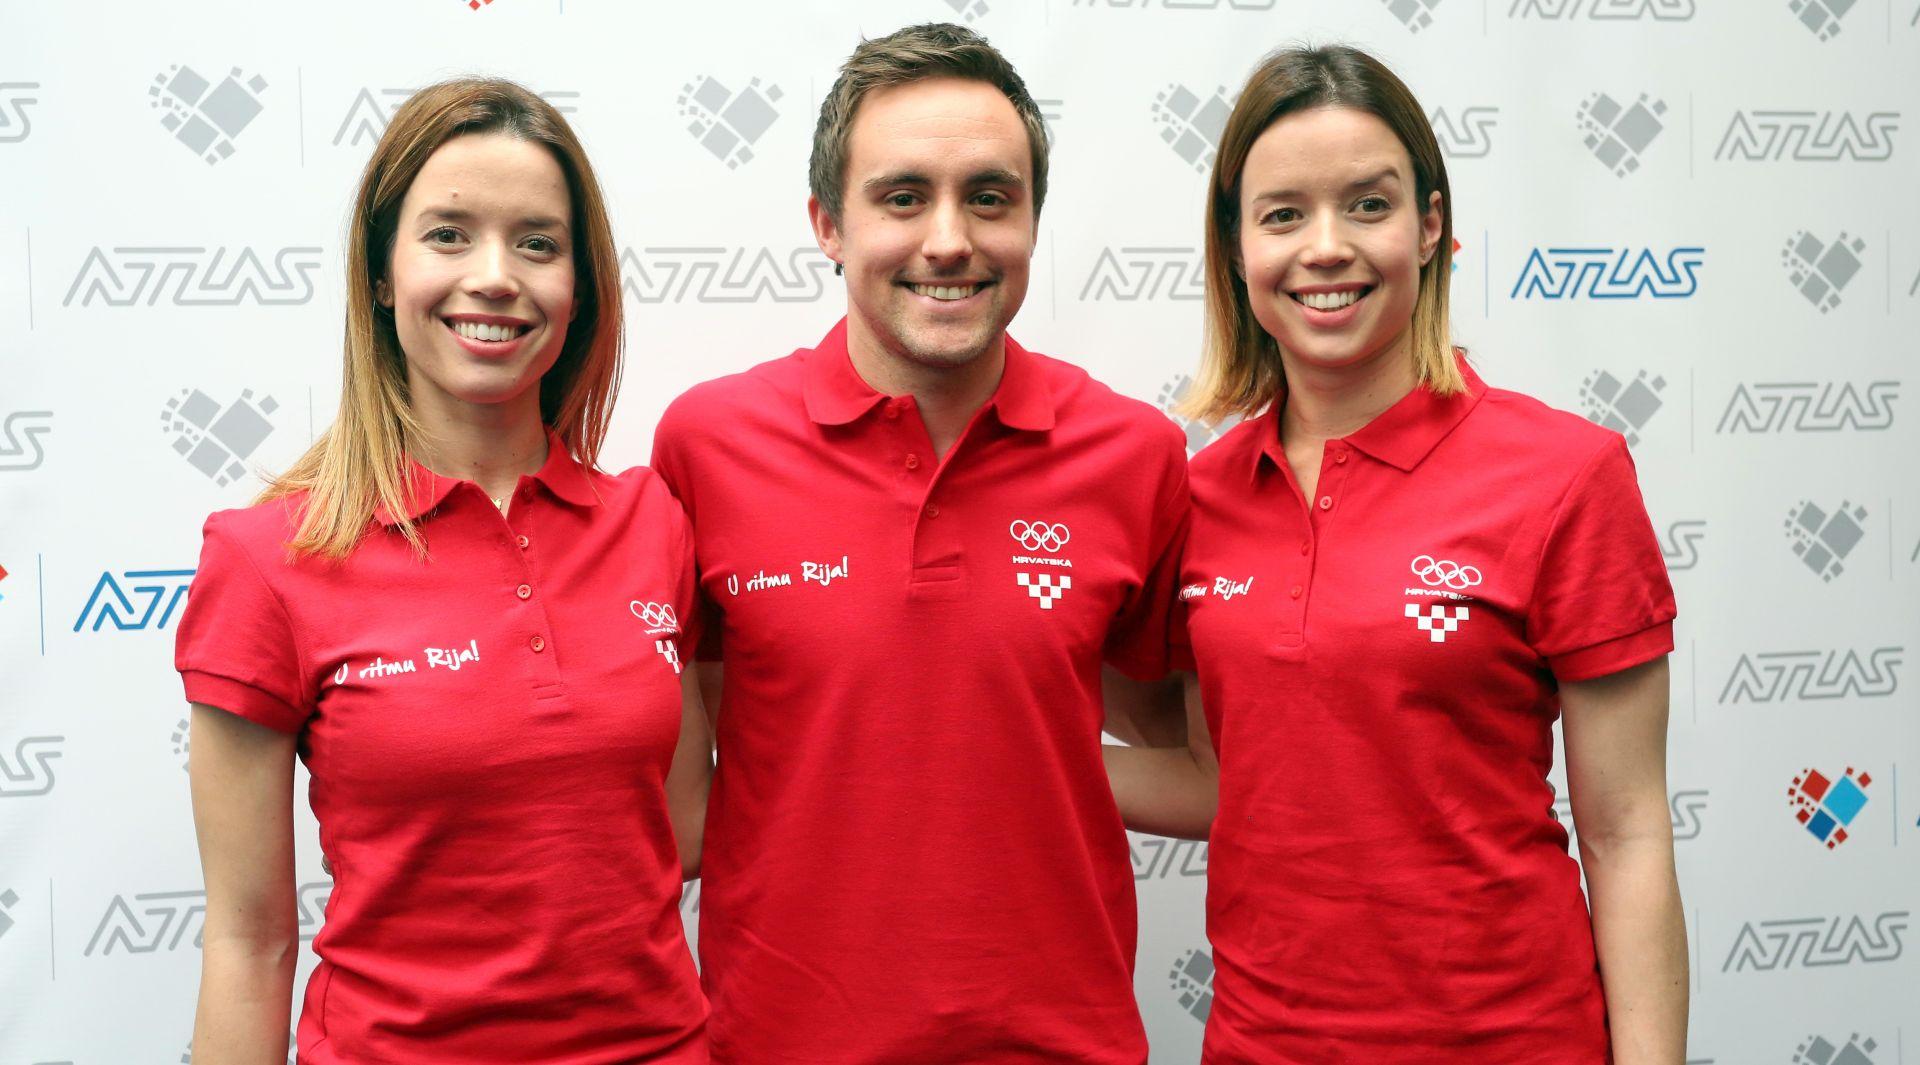 Hrvatska taekwondo reprezentacija: Dat ćemo maksimum u Rio de Janeiru